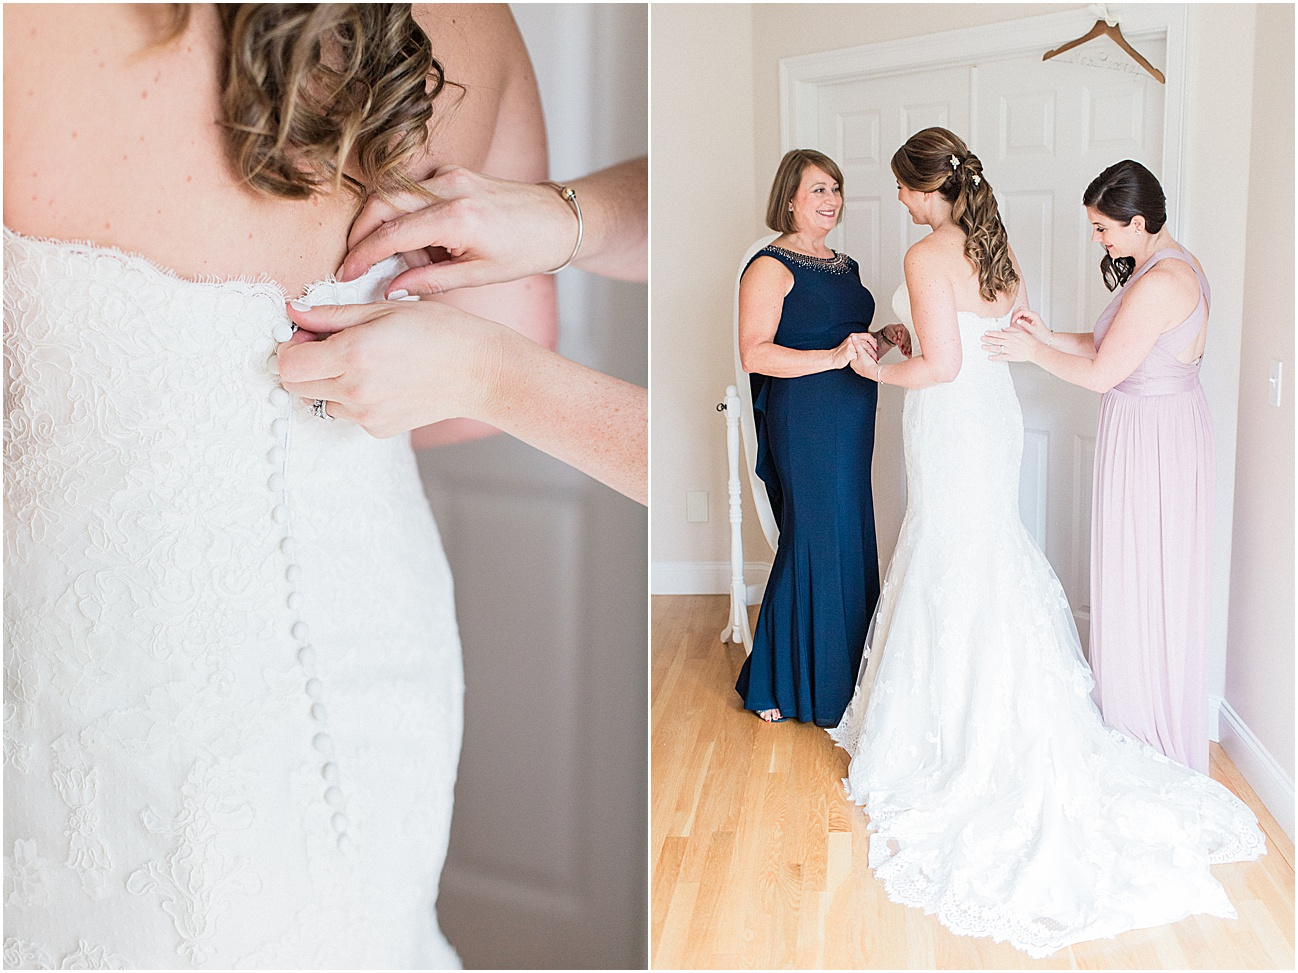 danielle_sean_willowbend_rain_rainy_day_cape_cod_boston_wedding_photographer_meredith_jane_photography_photo_1662.jpg